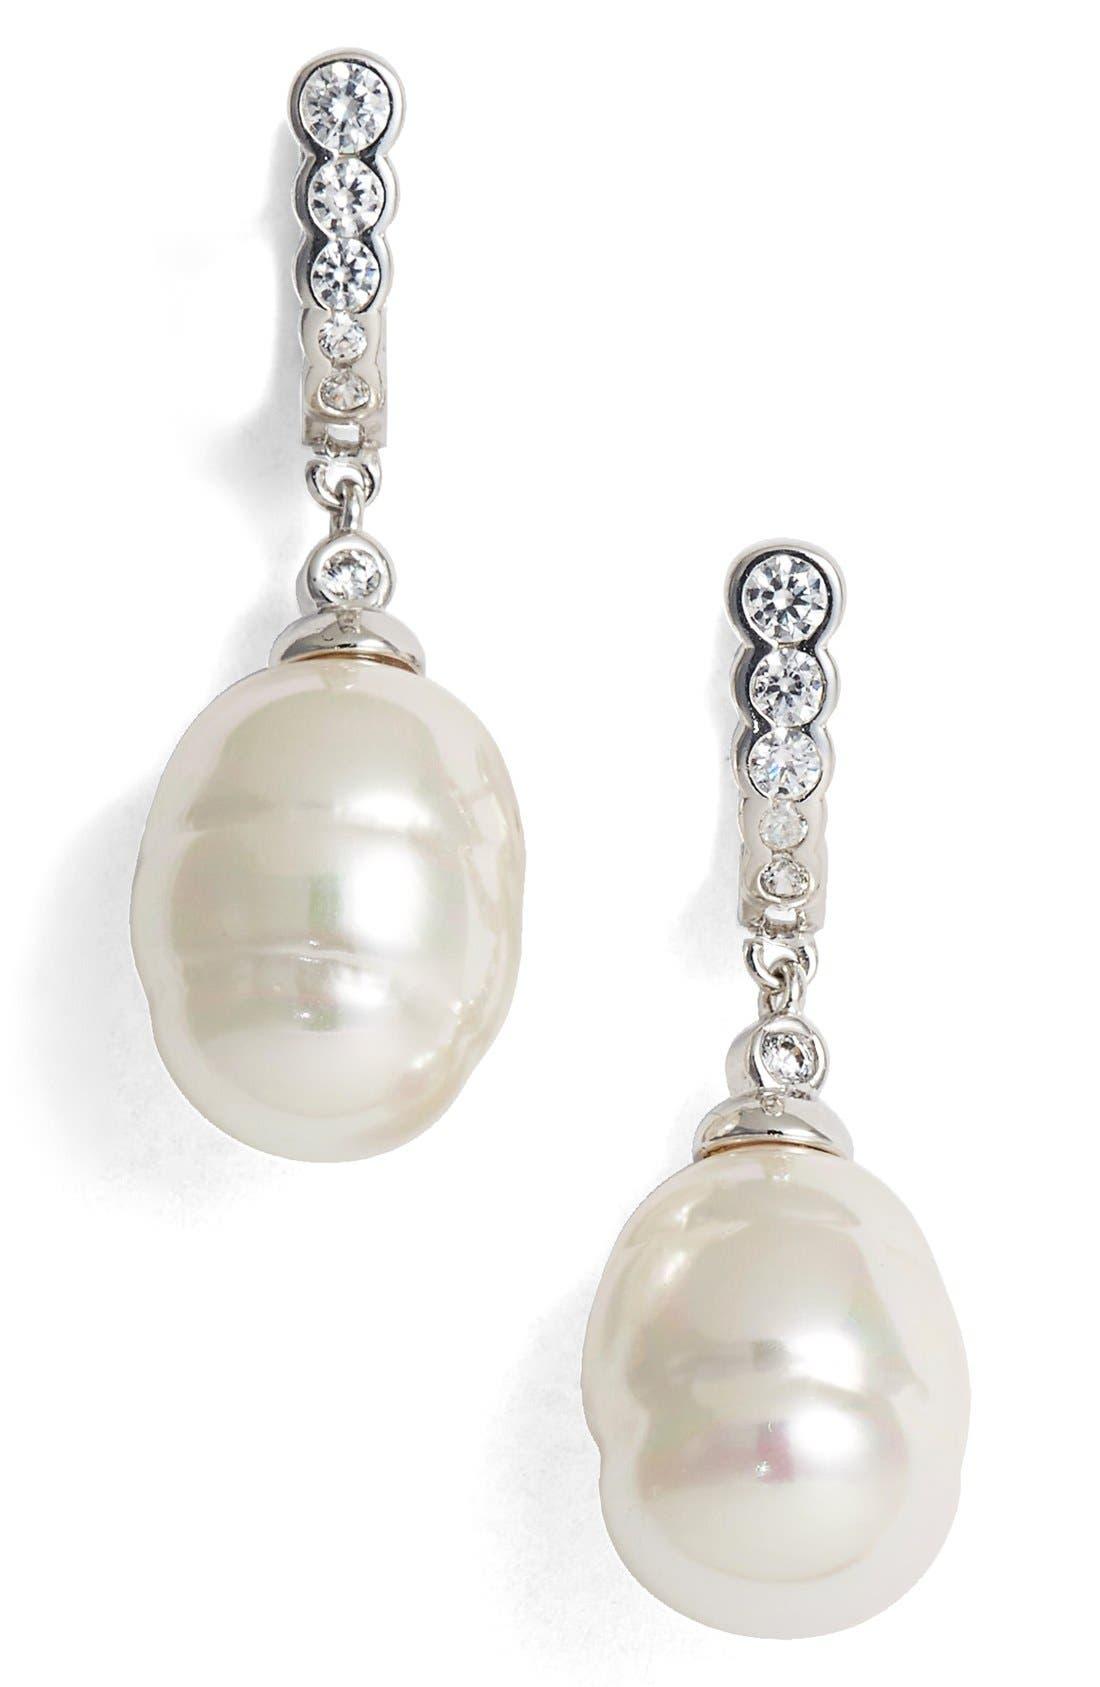 MAJORICA 14mm Simulated Baroque Pearl & Cubic Zirconia Drop Earrings